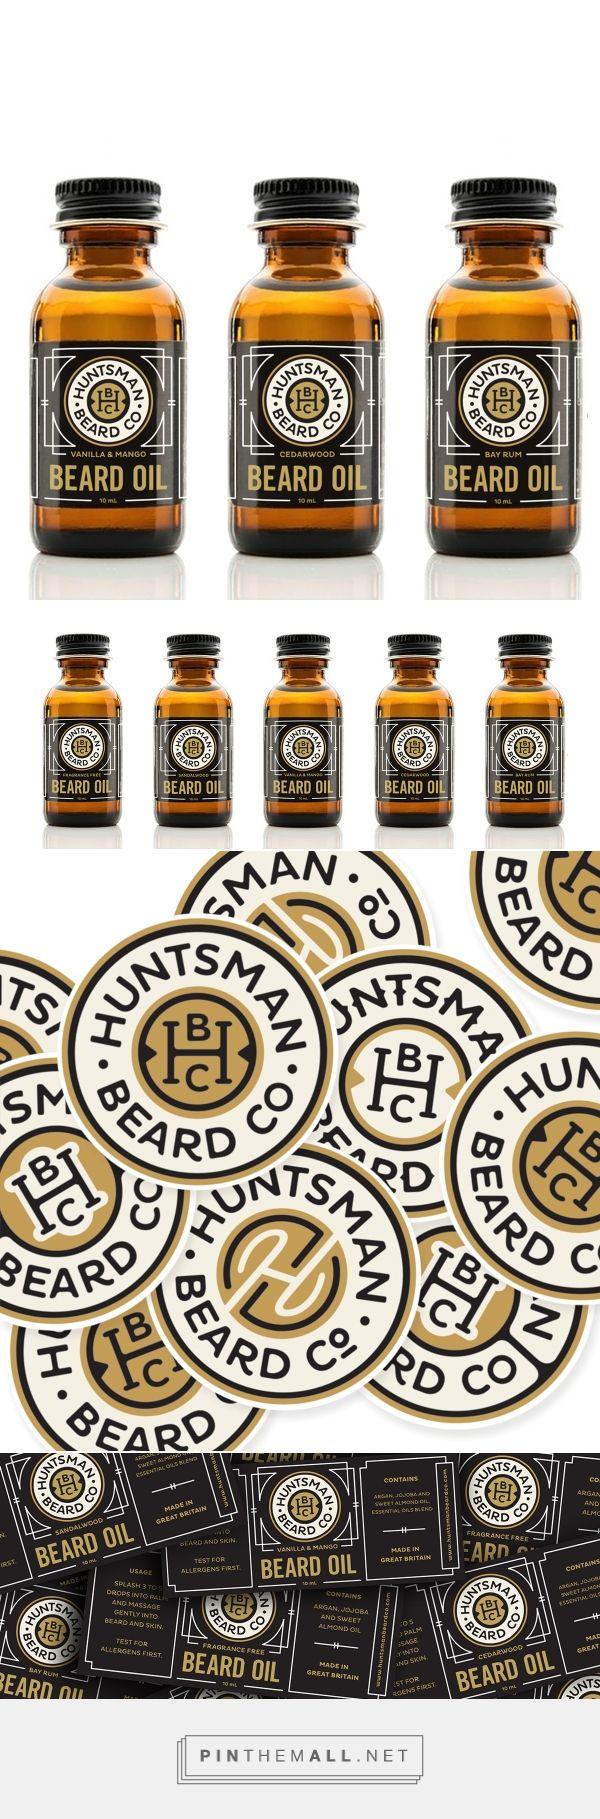 Huntsman Beard Co // Anna Ropalo